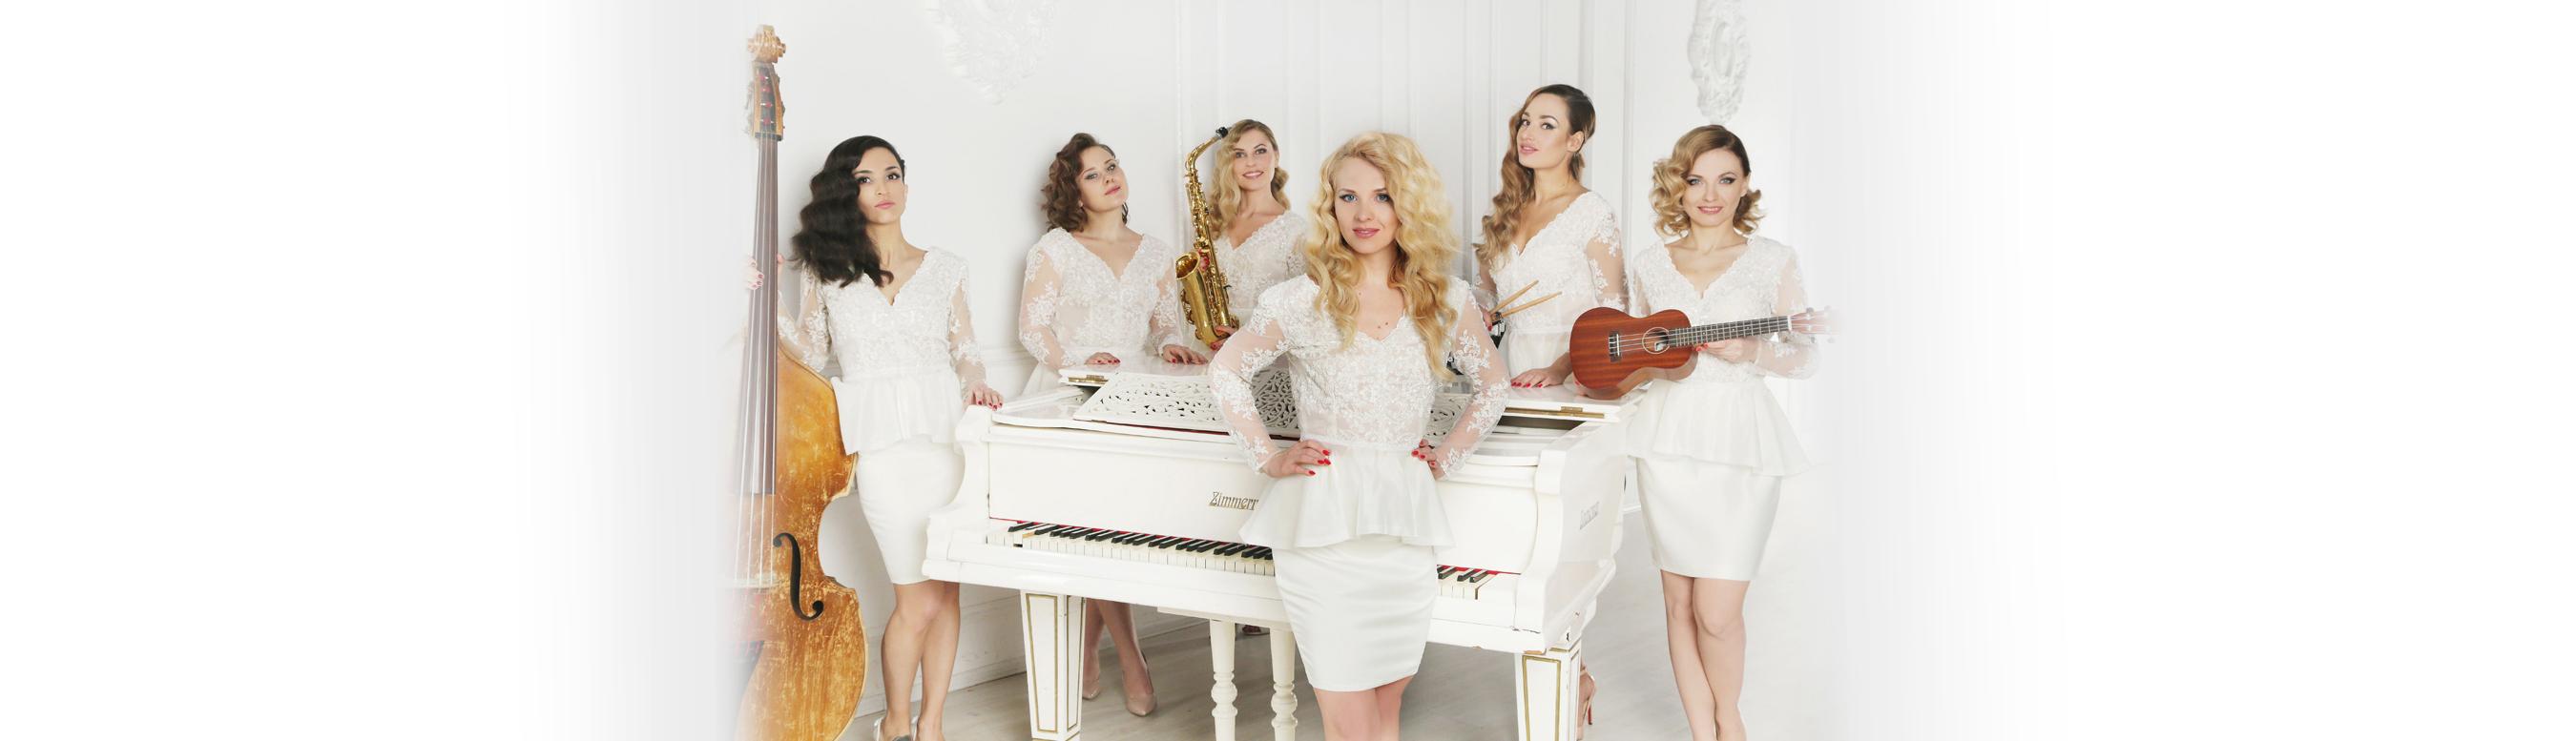 Сover-группа Women's band Ш.И.К.